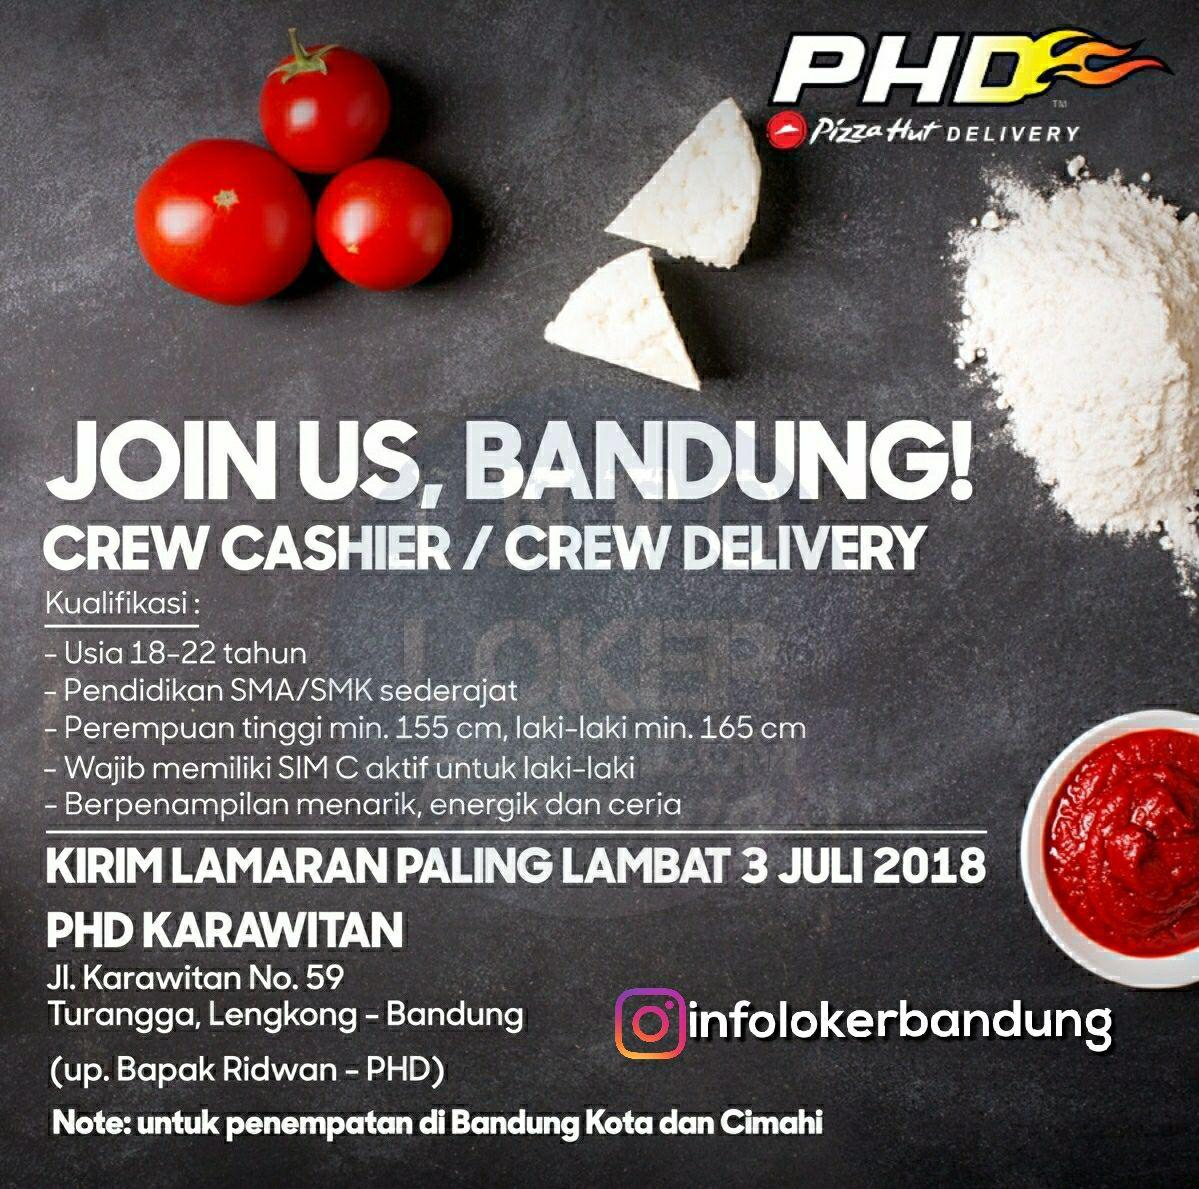 Lowongan Kerja PHD ( Pizza Hut Delivery ) Karawitan Bandung Juli 2018 - infolokerbandung.com